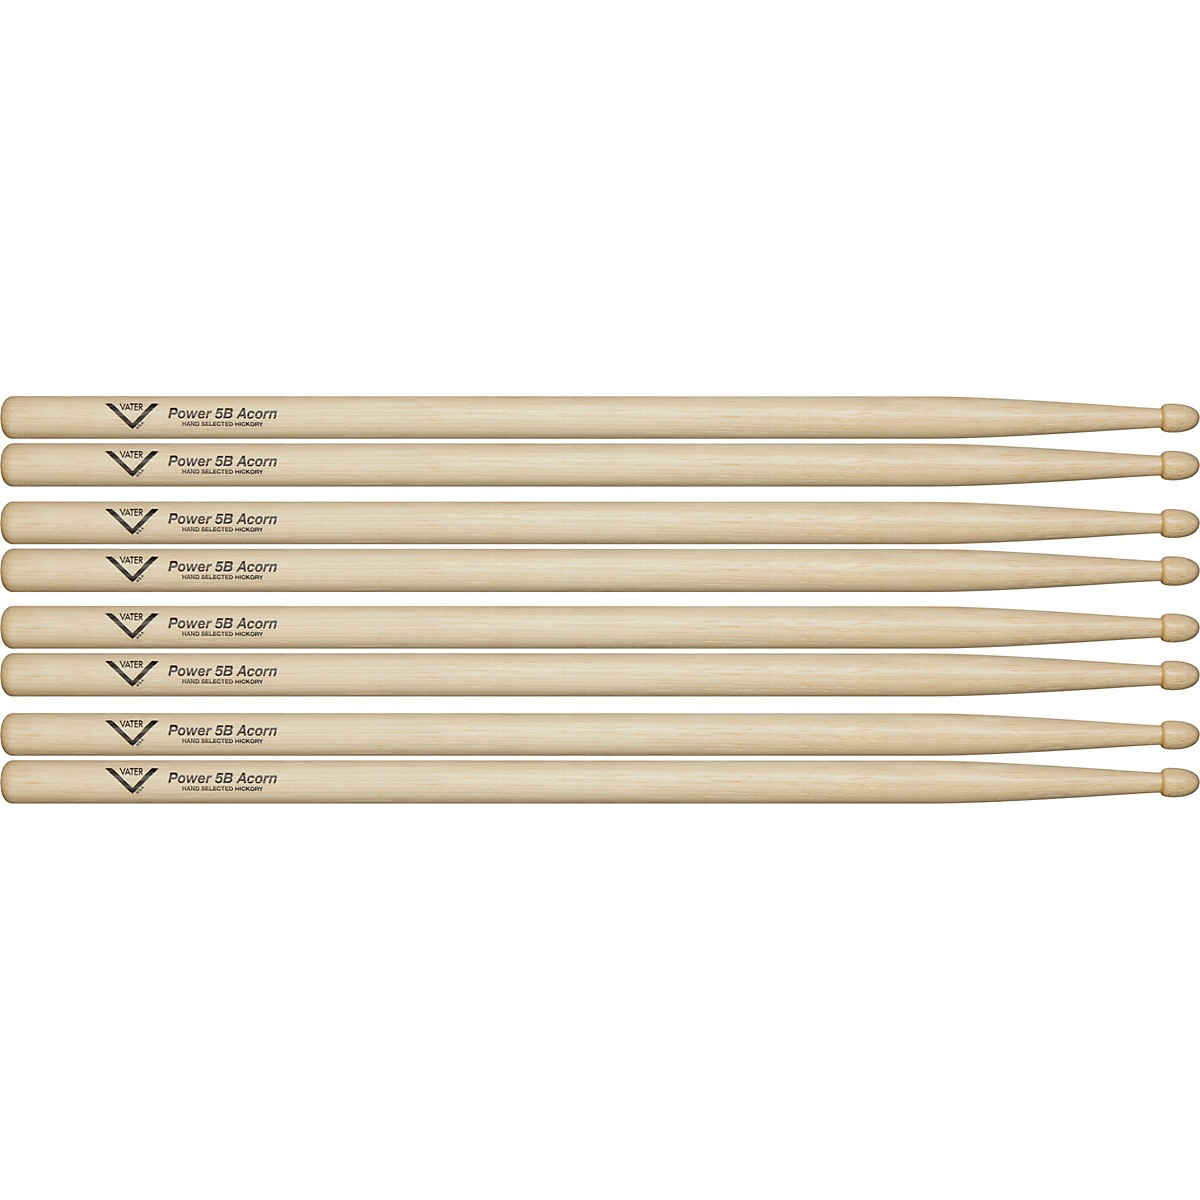 Vater Power 5B Acorn Drum Sticks - Buy 3, Get 1 Free Value Pack